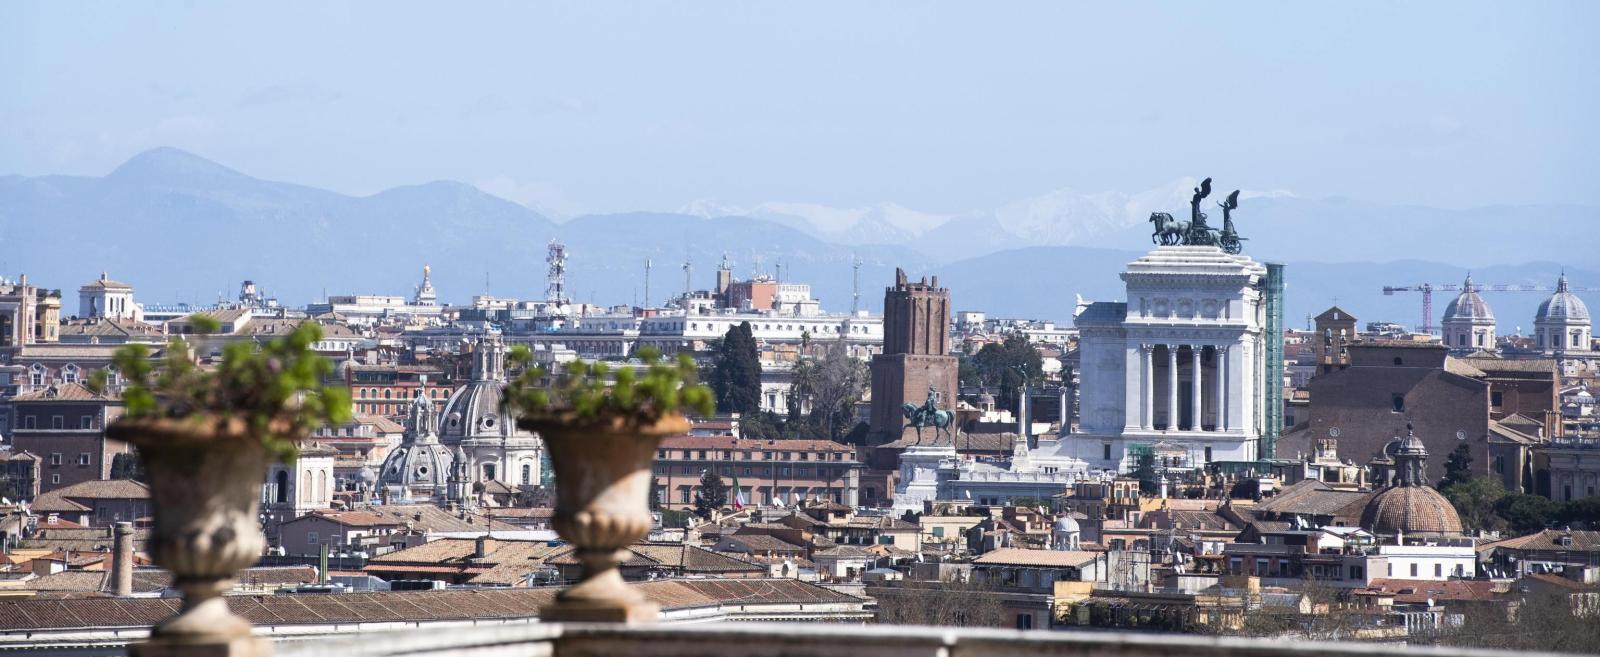 Panorama Rzymu EPA/CLAUDIO PERI